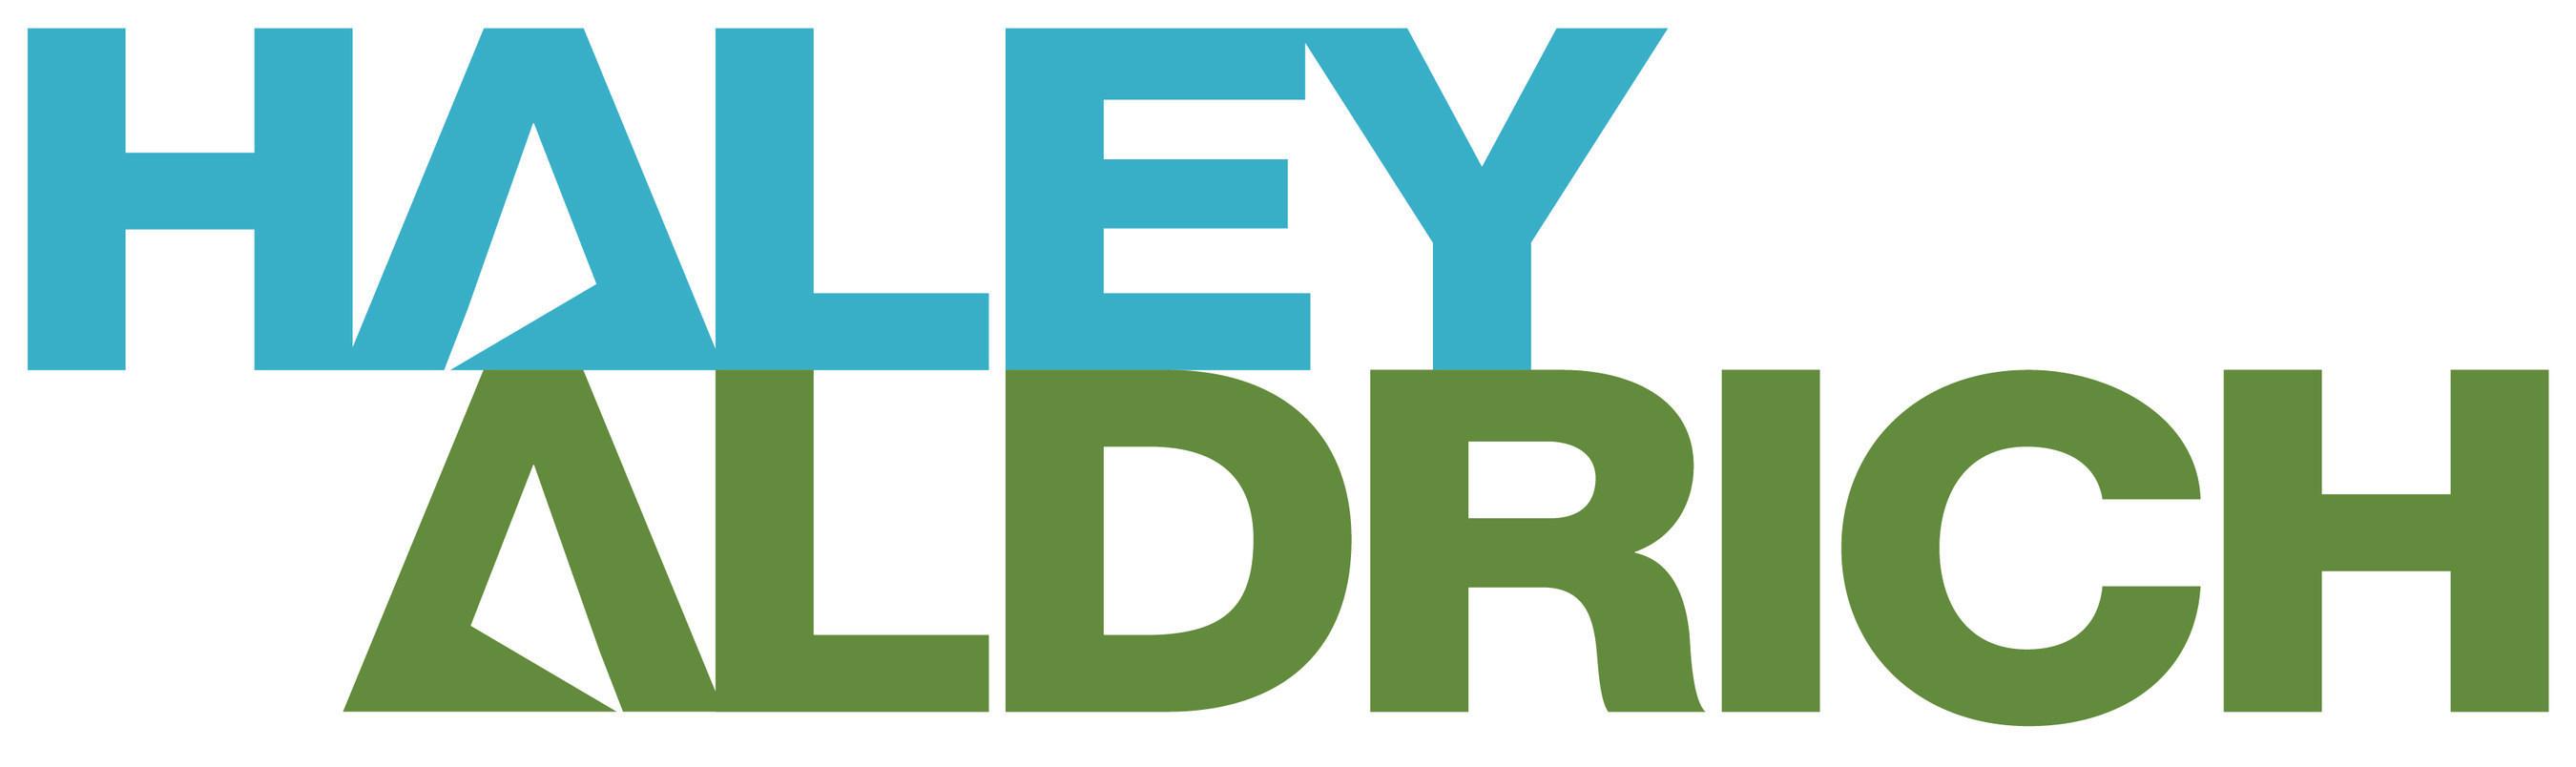 Haley & Aldrich logo